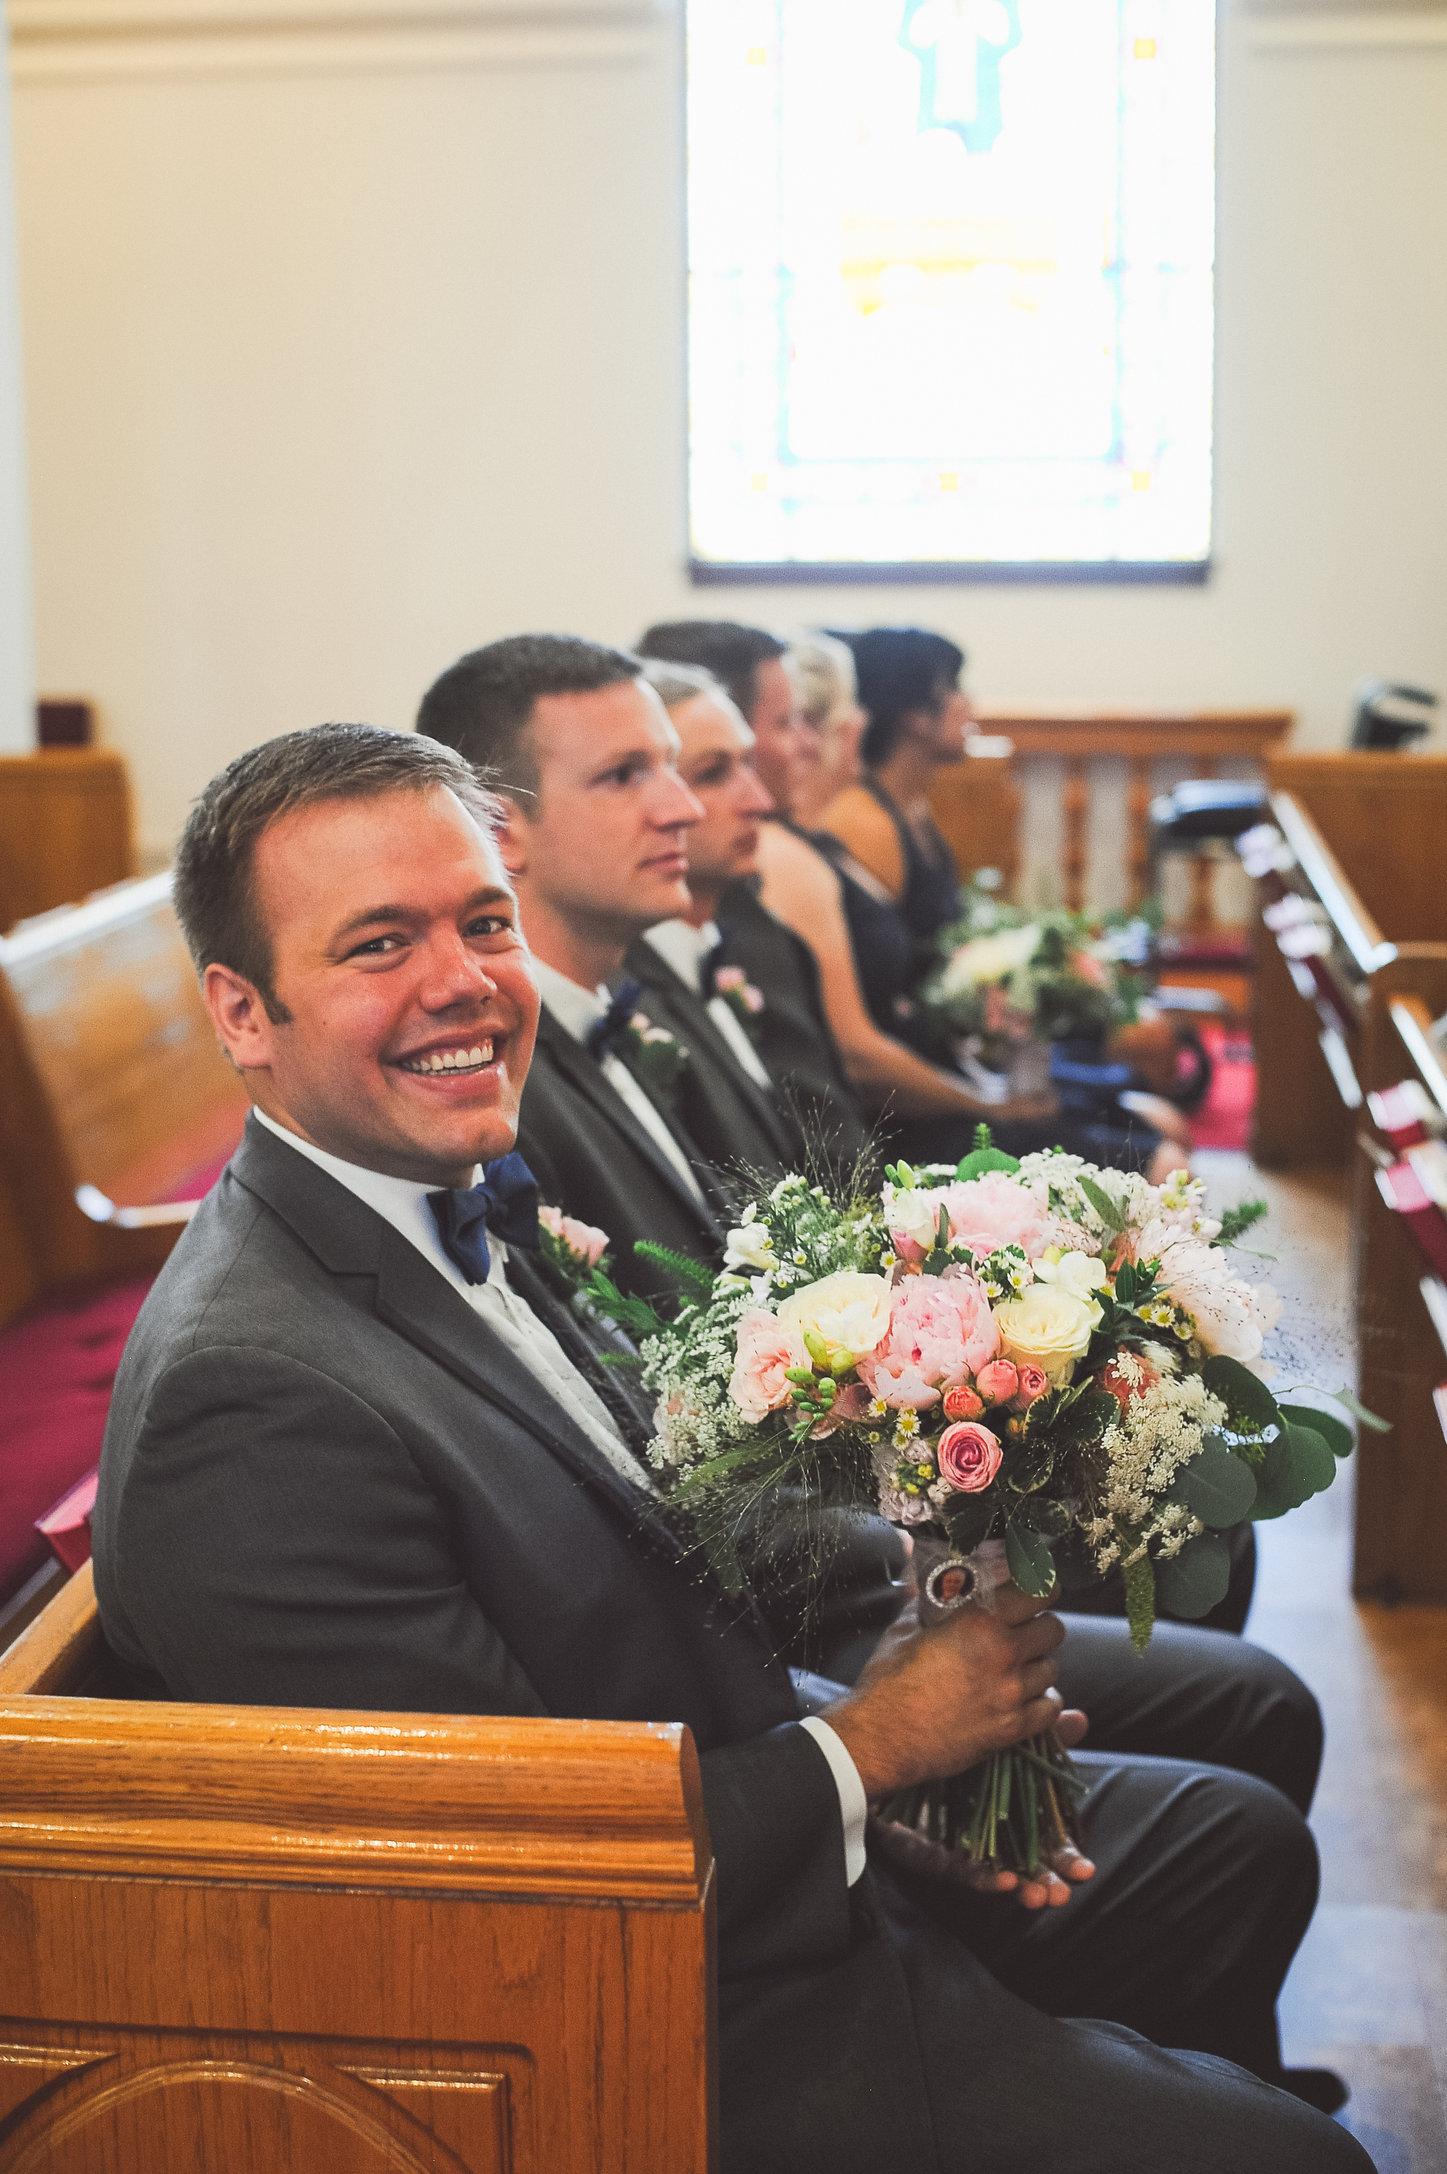 SandC-wedding-243.jpg